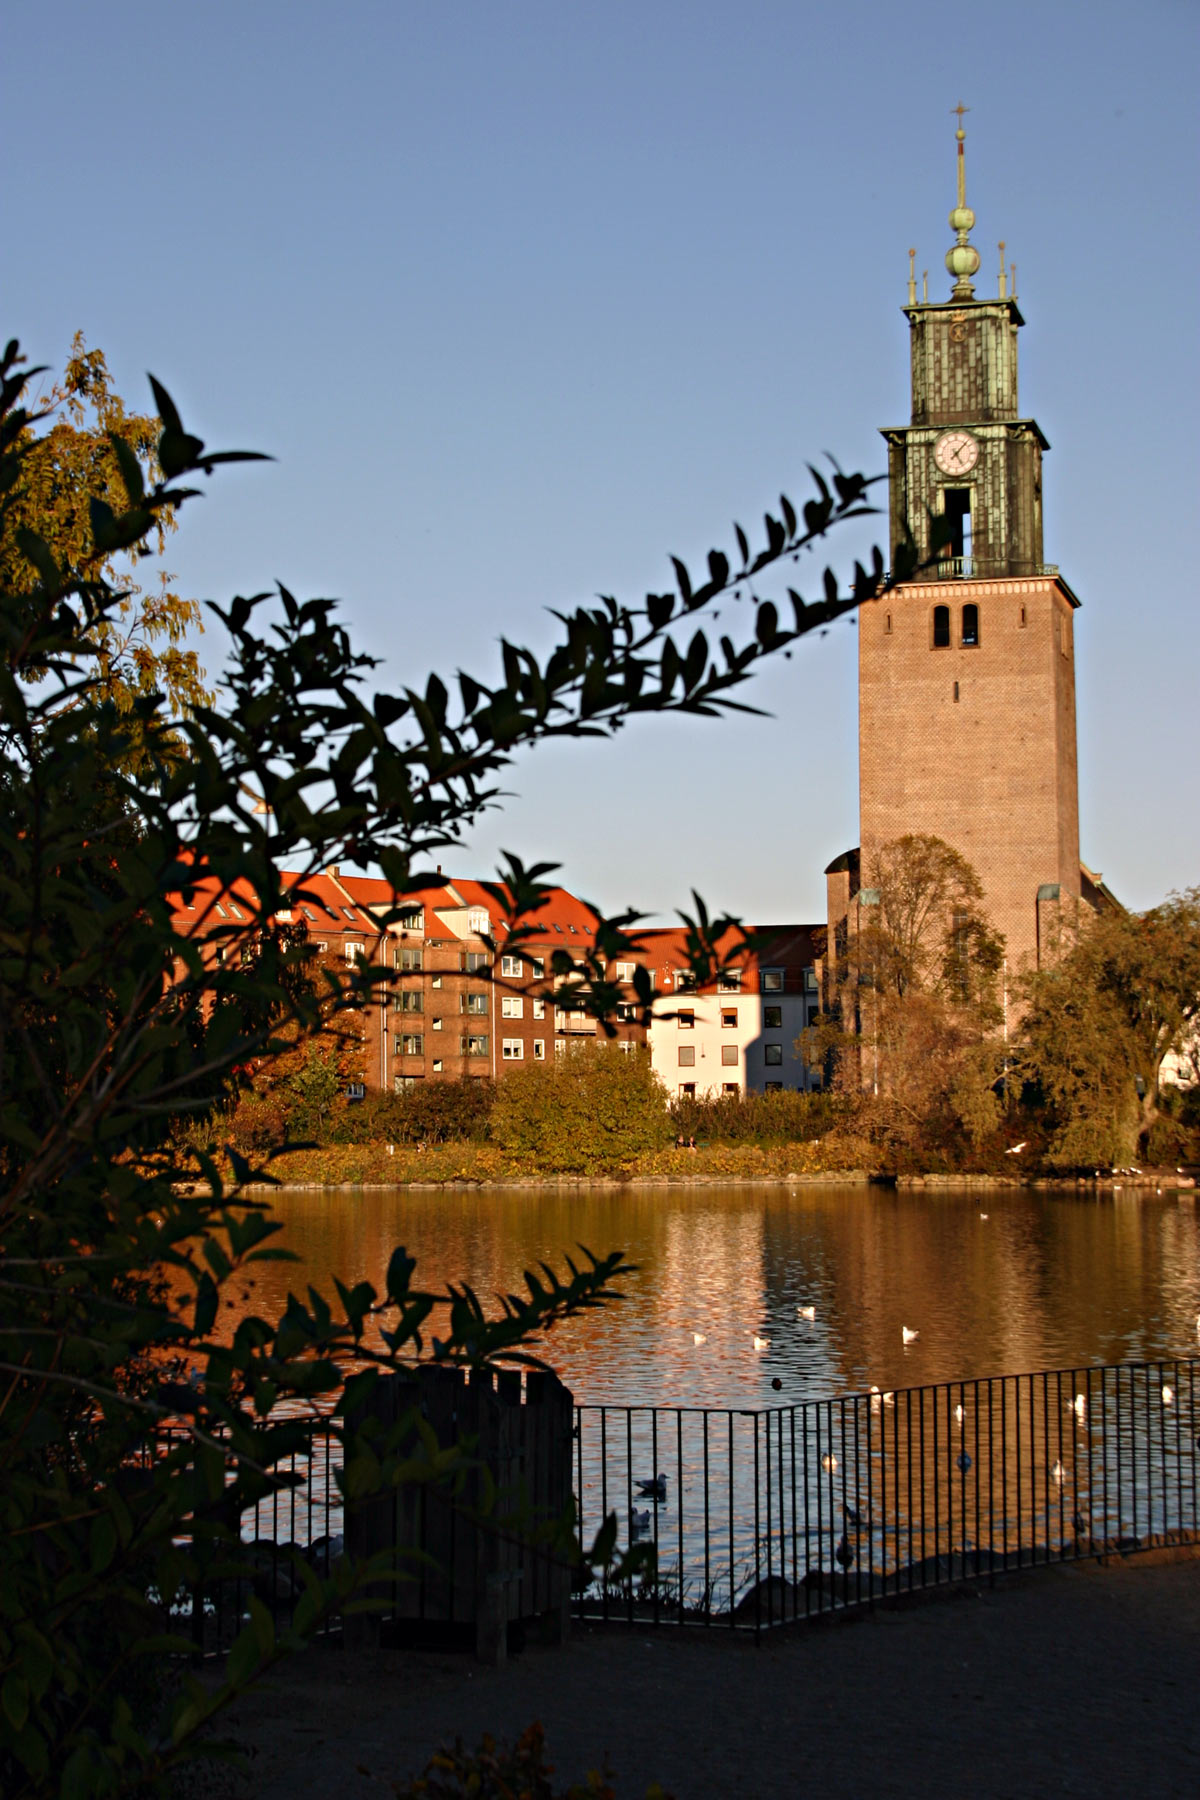 Church by the park, Church, City, Clock, Fence, HQ Photo